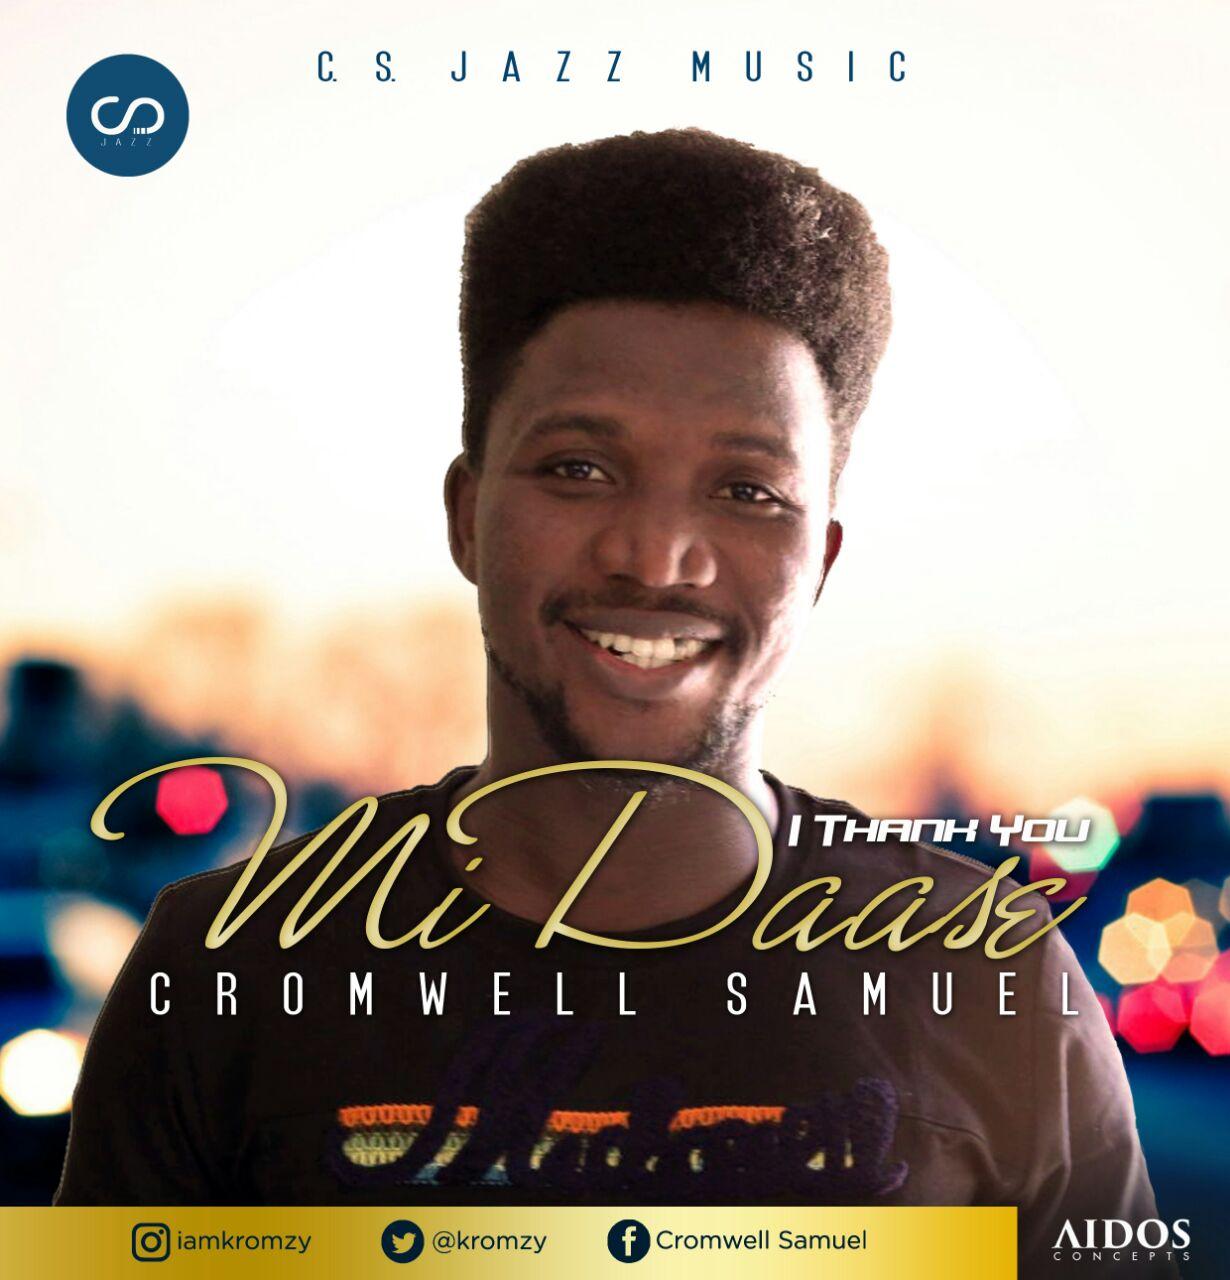 DOWNLOAD Music: Cromwell Samuel – Midaasi (I Thank You)